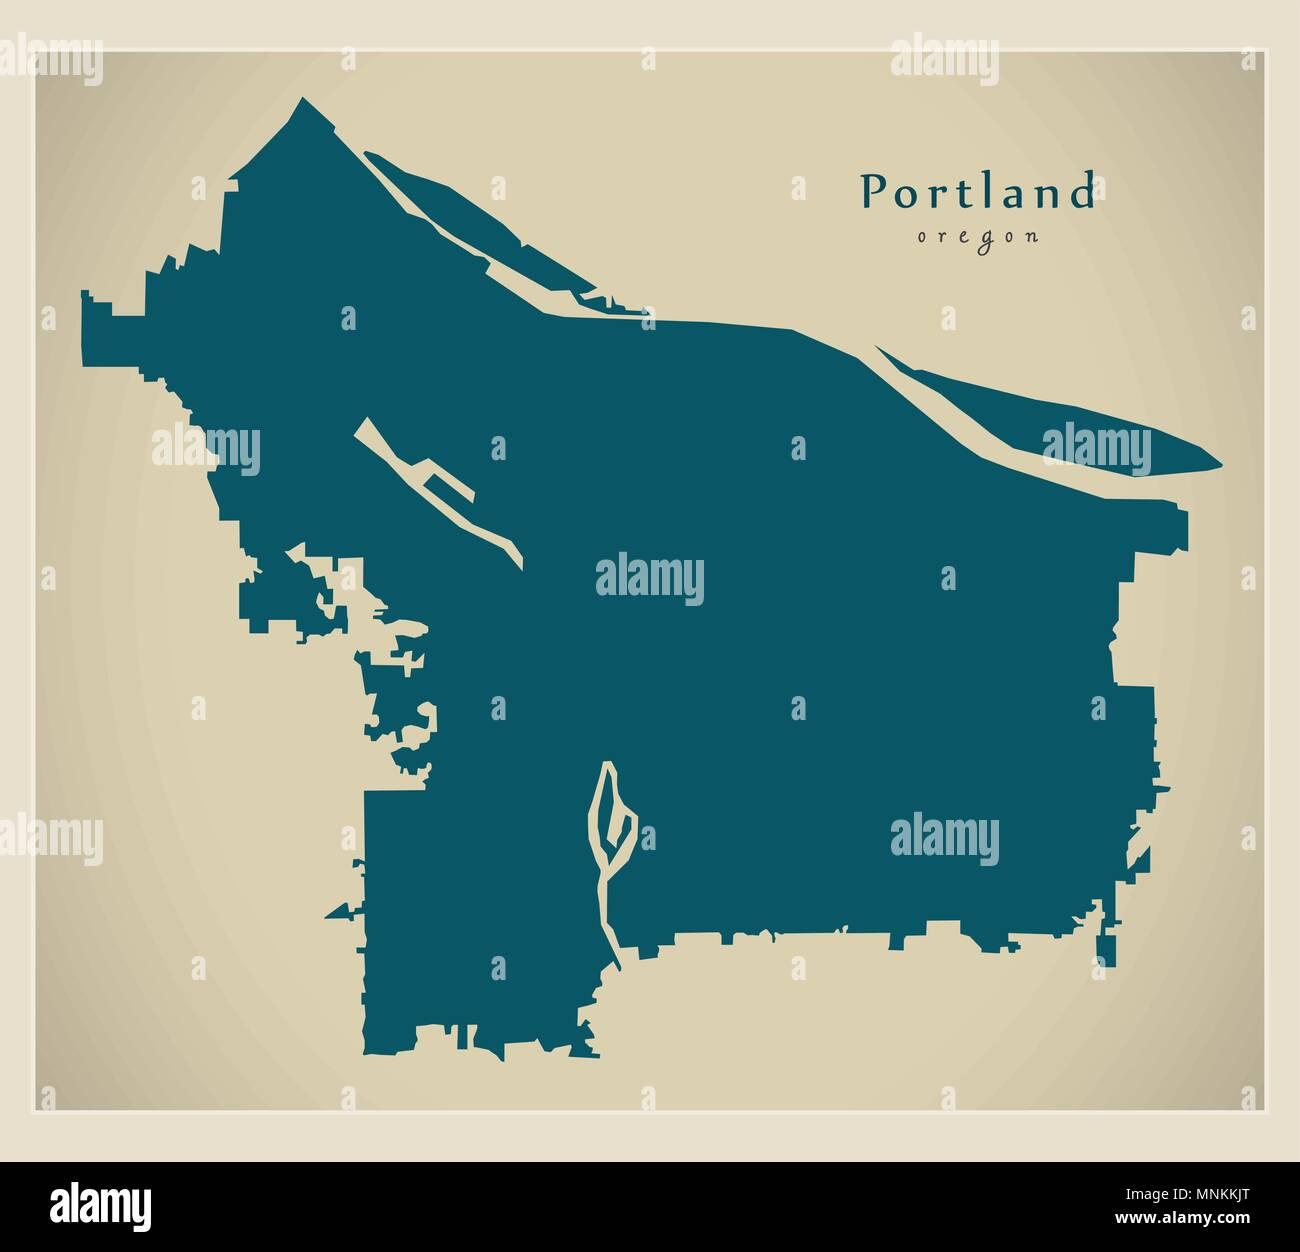 Modern City Map - Portland Oregon city of the USA Stock Vector Art ...